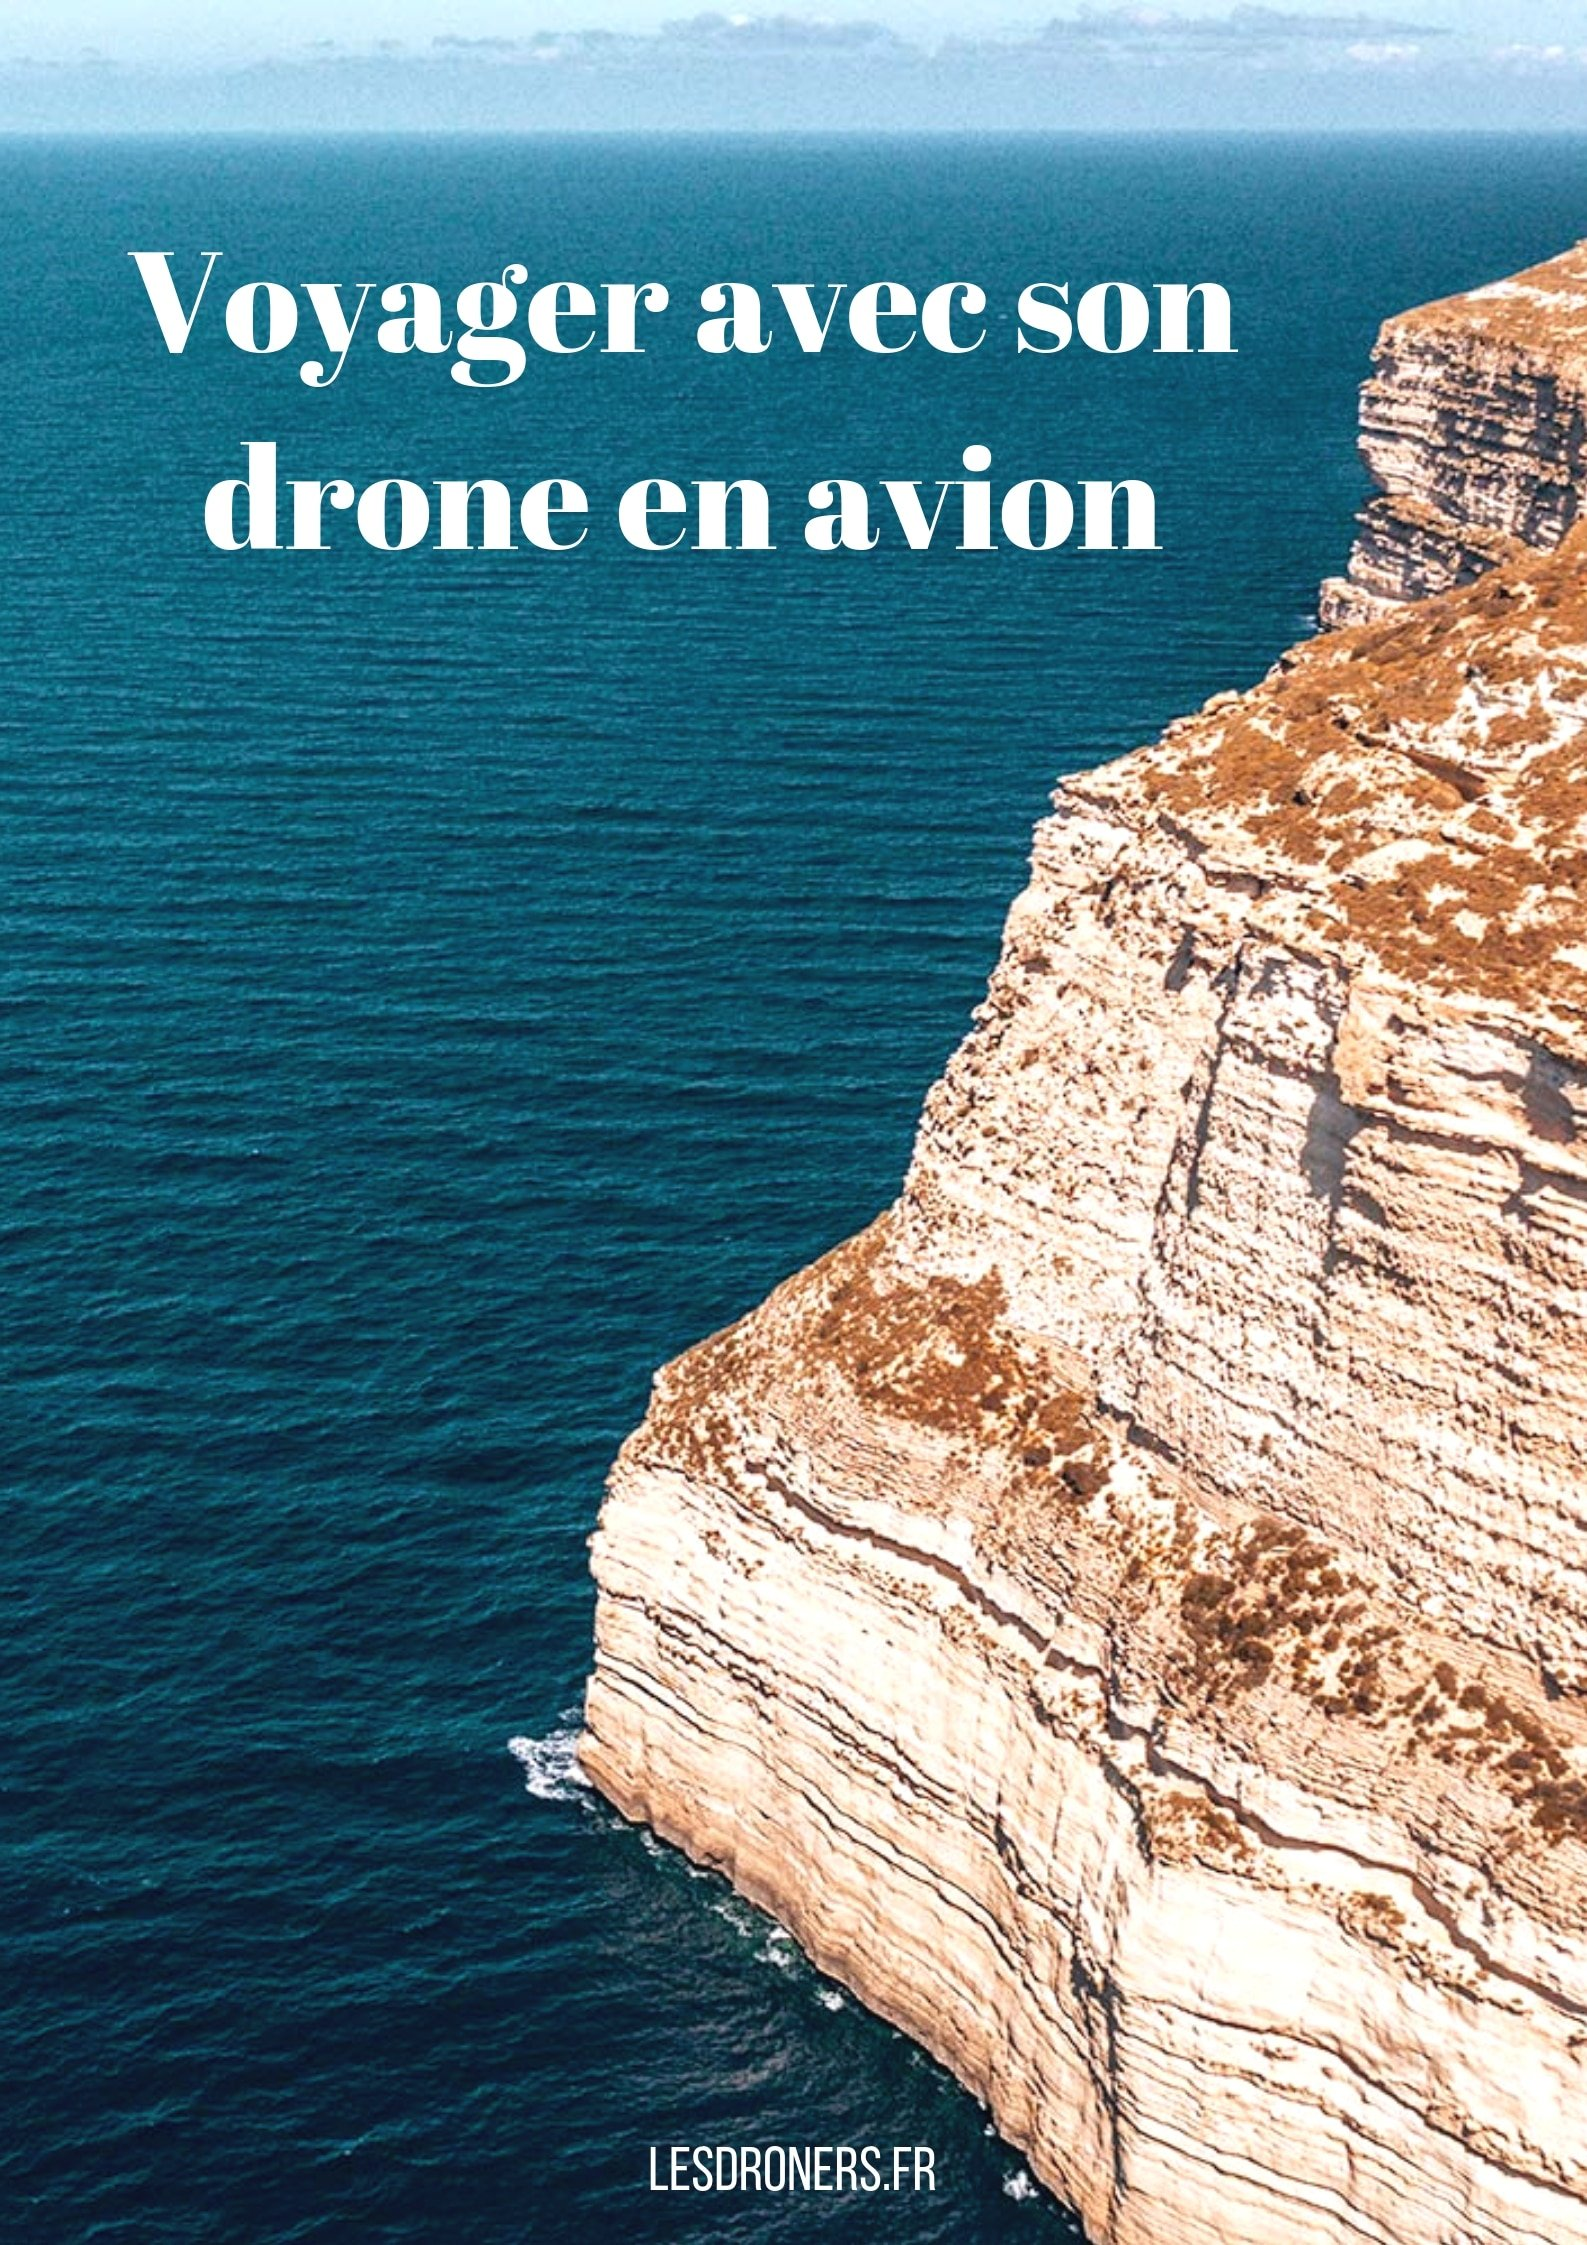 voyager avec son drone en avion